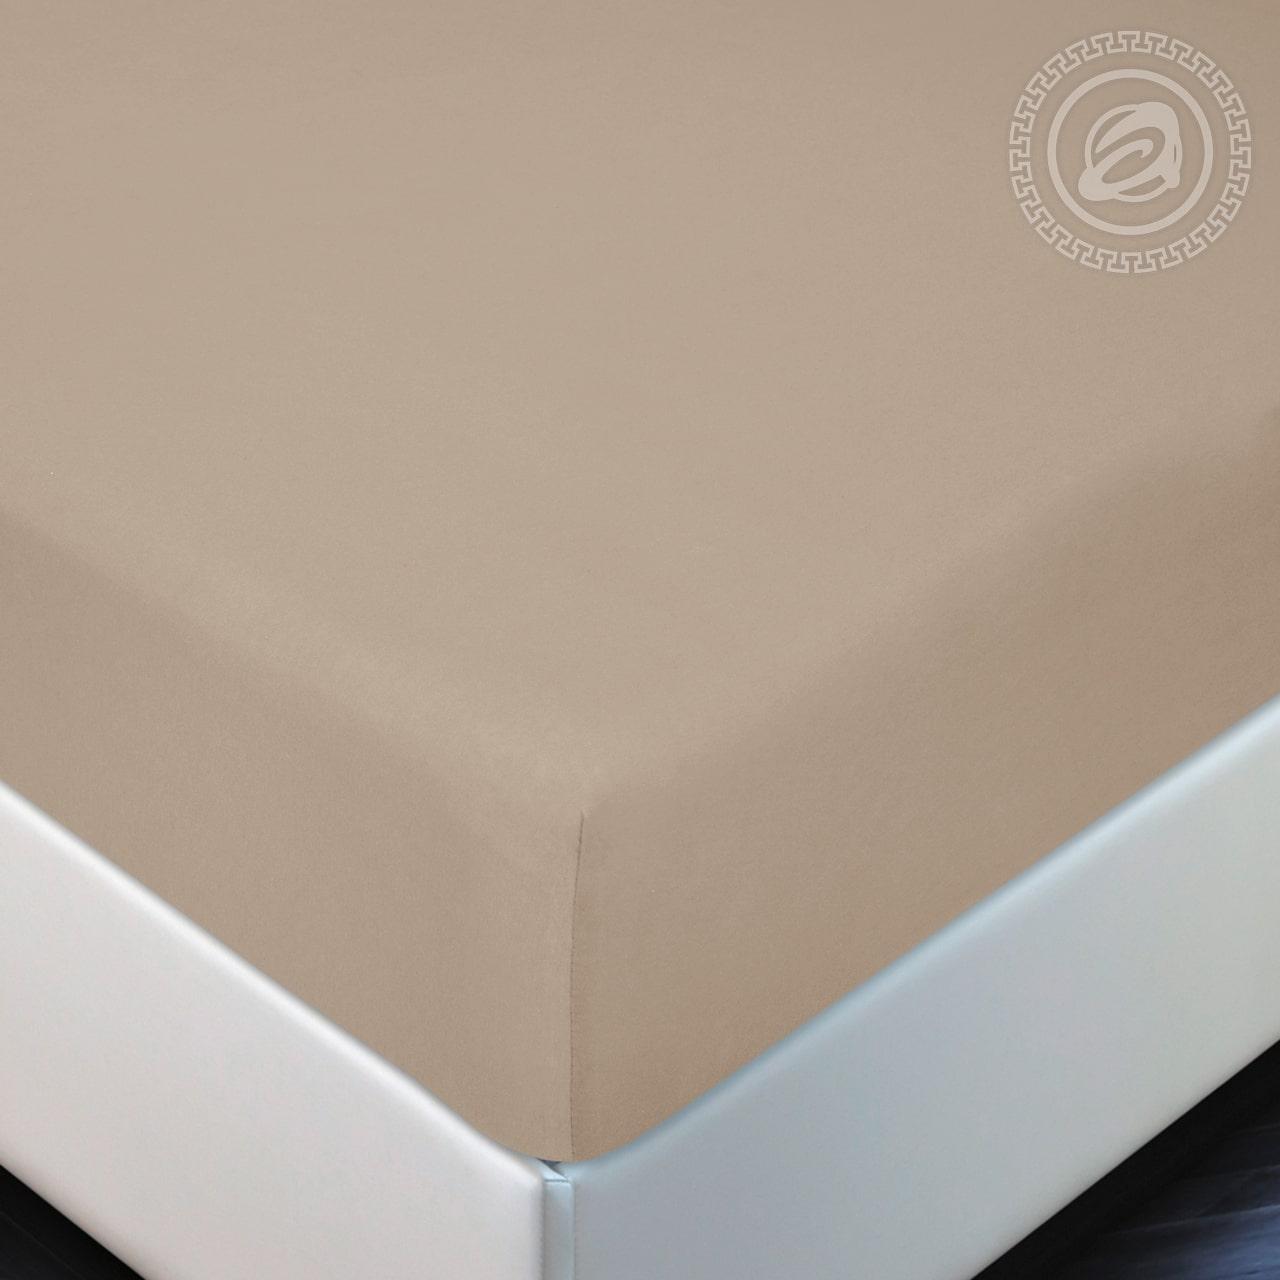 Простыня на резинке iv61949 (трикотаж) 60х120